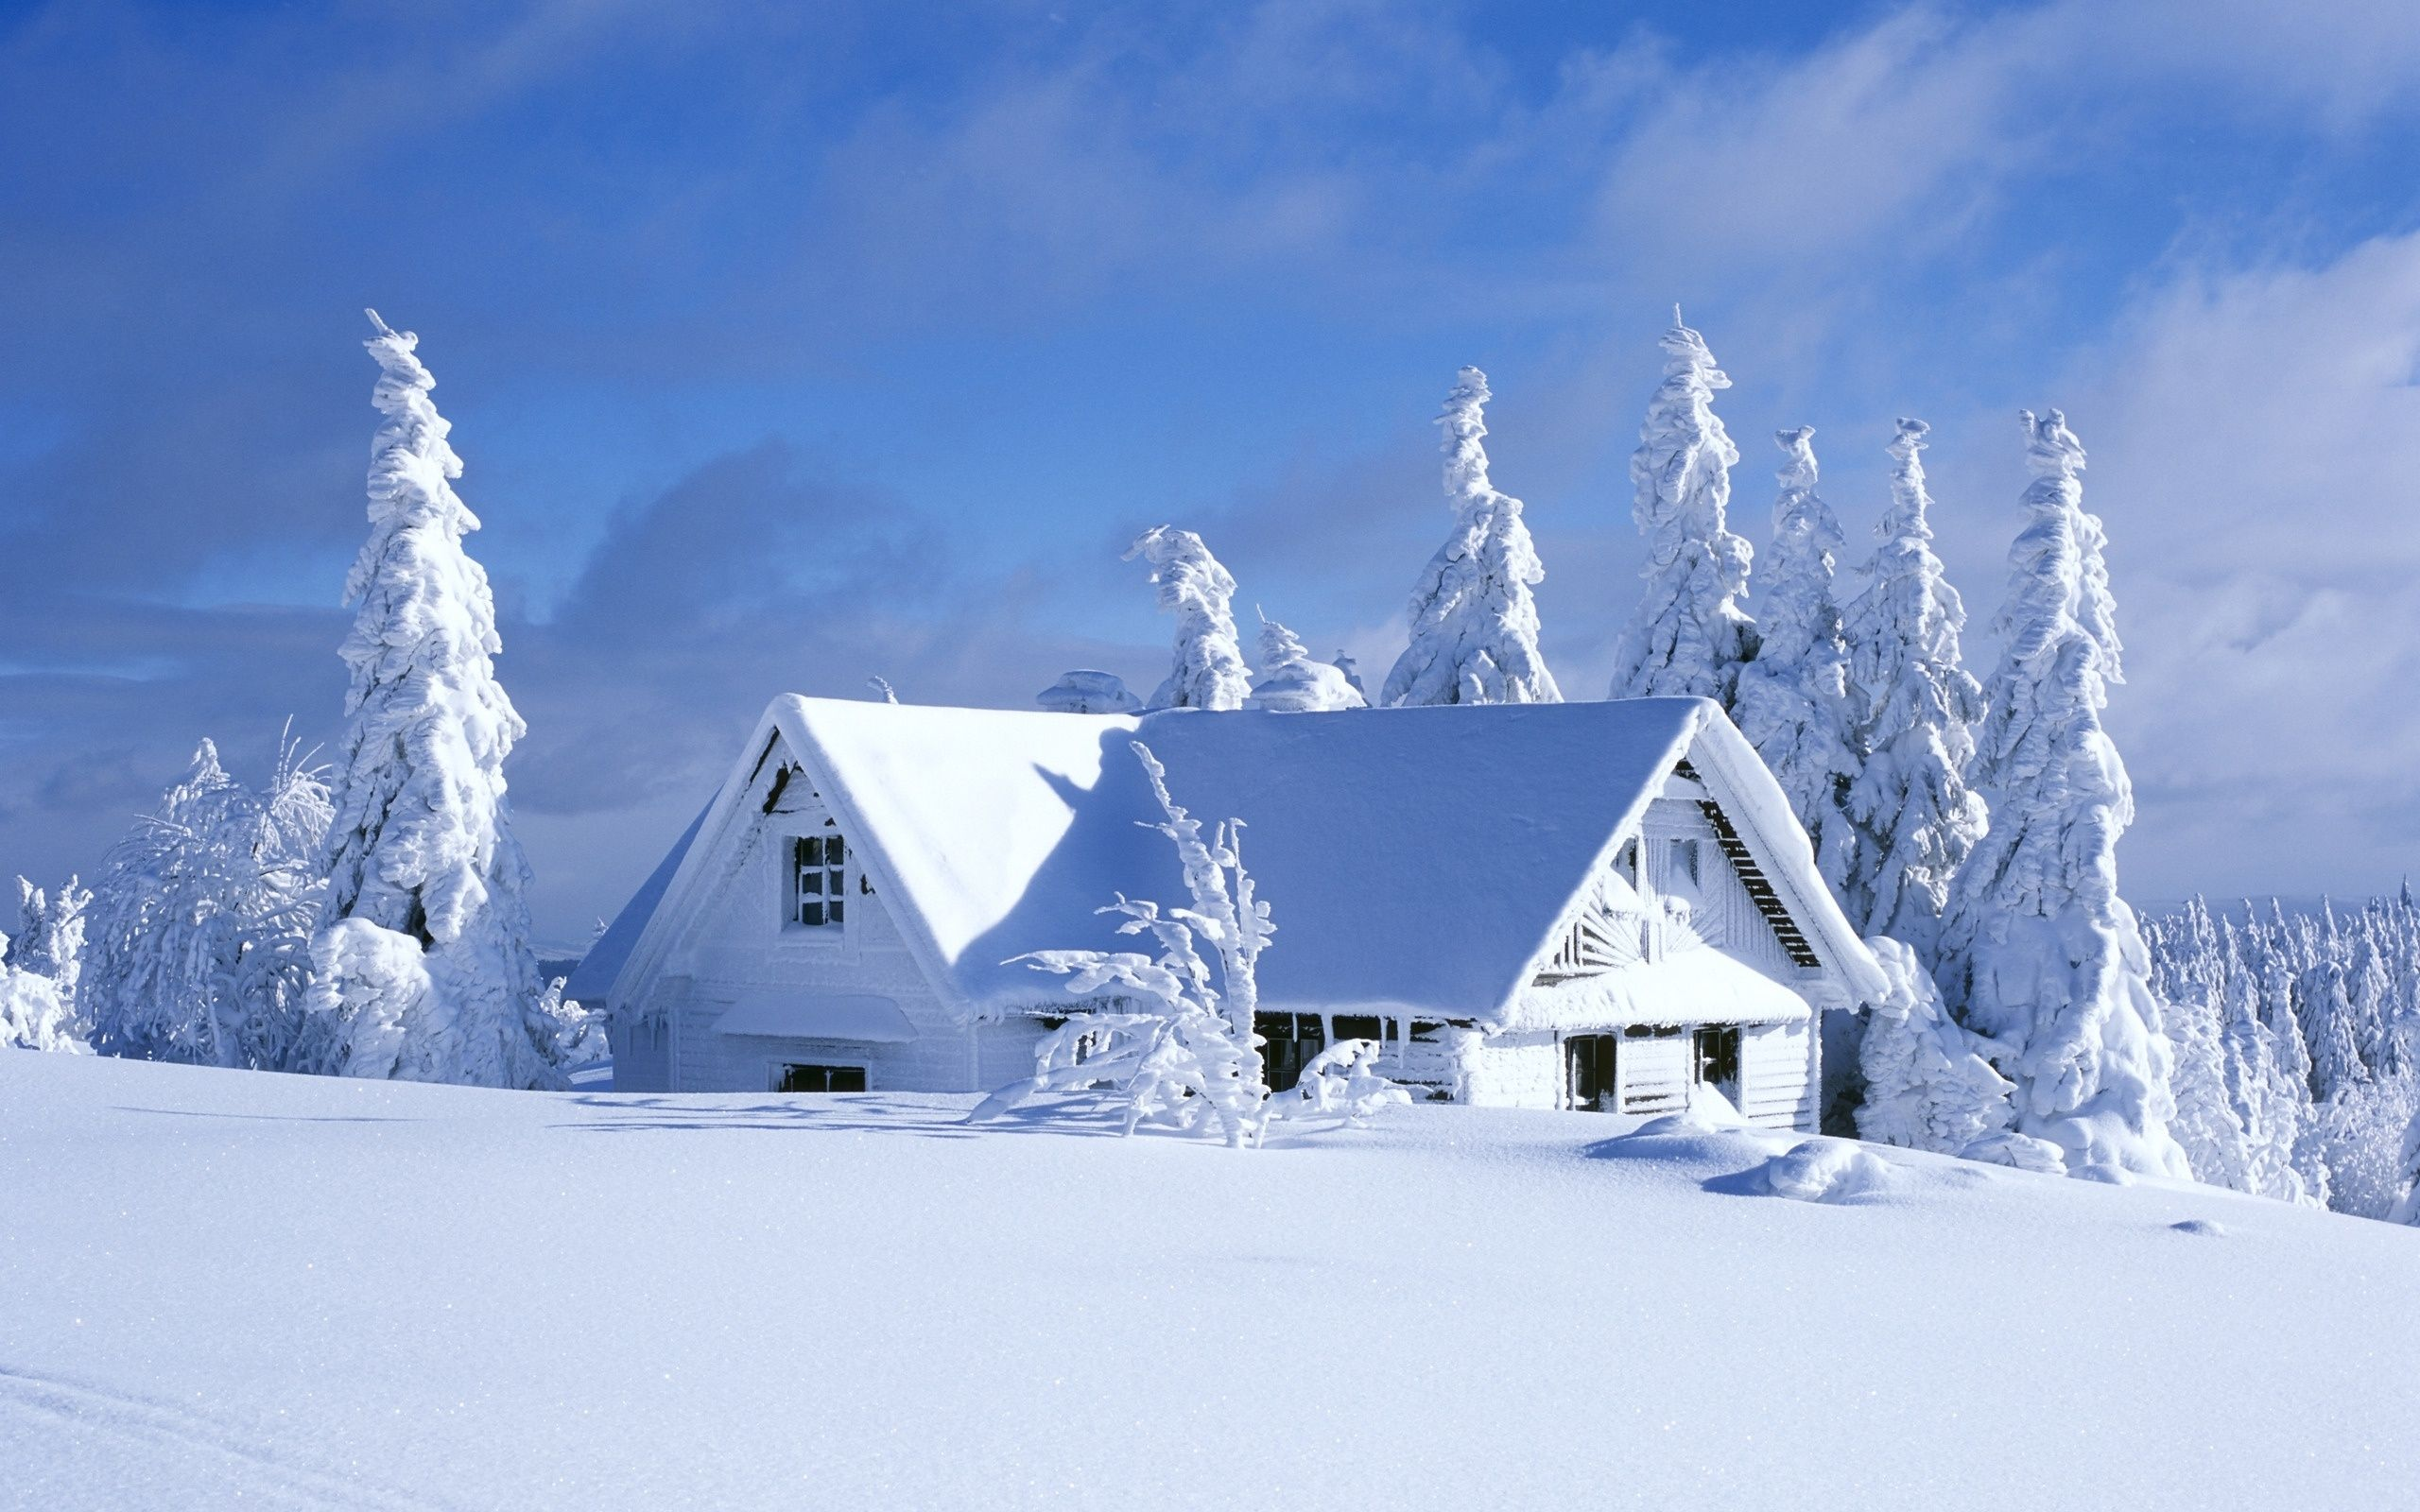 Snow Desktop Wallpaper Snow Images Free Winter Snow Wallpaper Winter Wallpaper Winter House